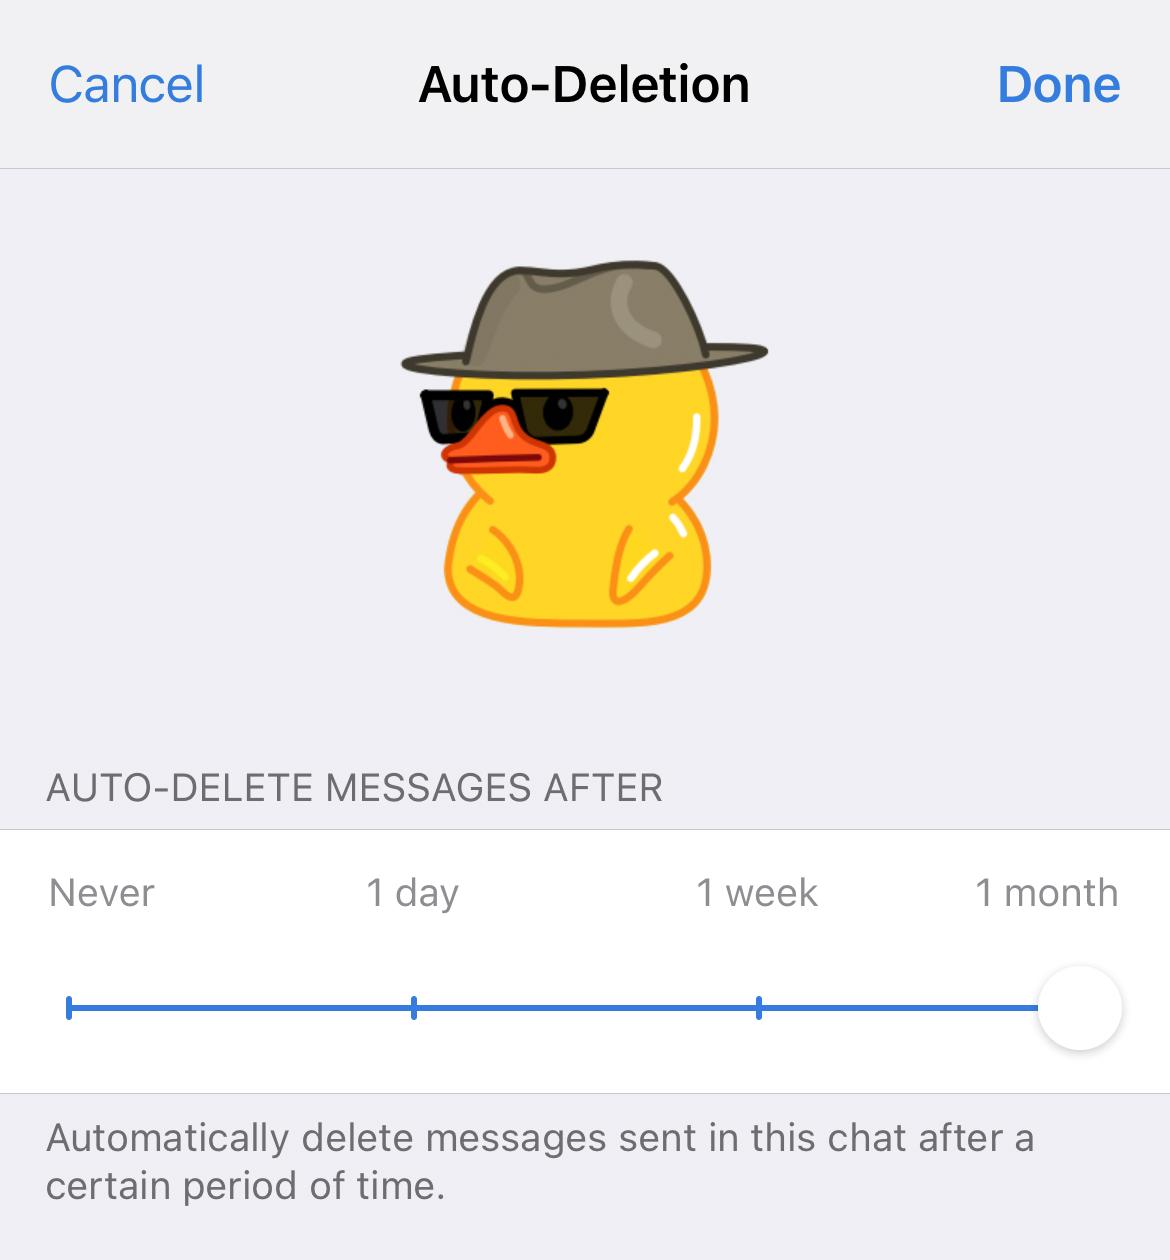 The auto deletion option in Telegram